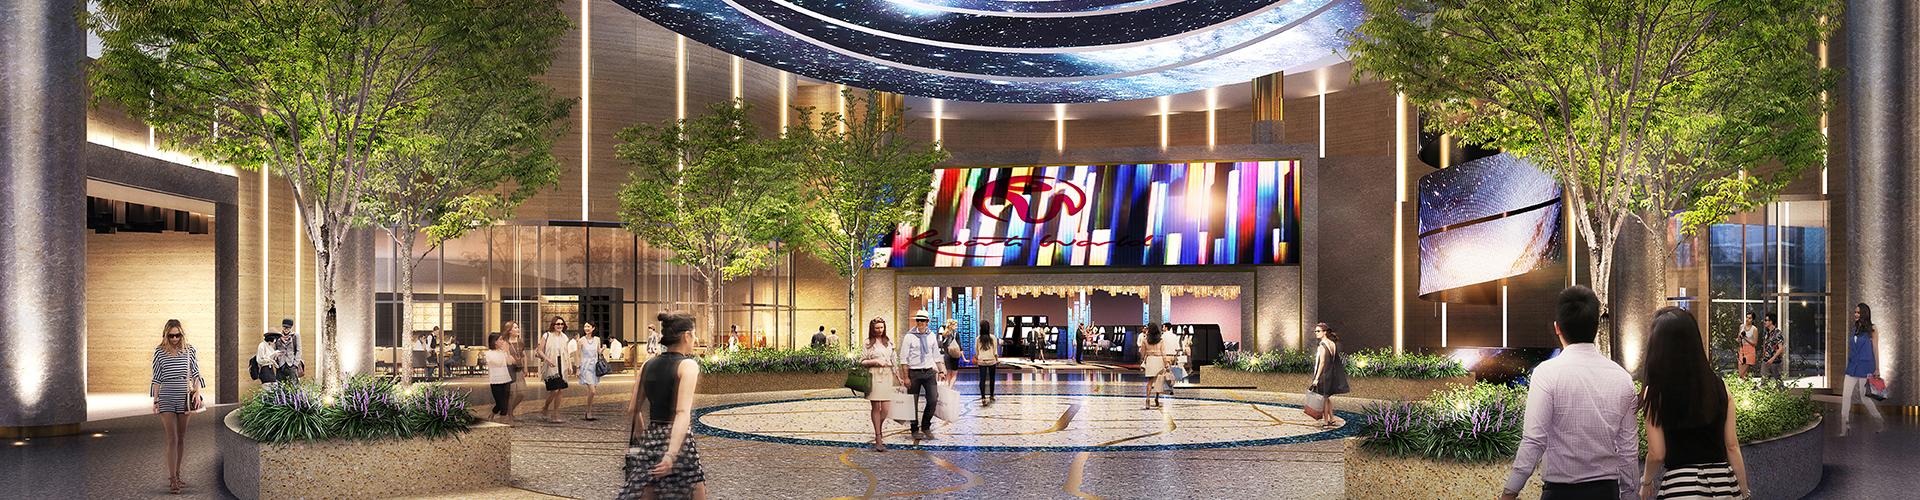 Resorts World NYC Grand Lobby